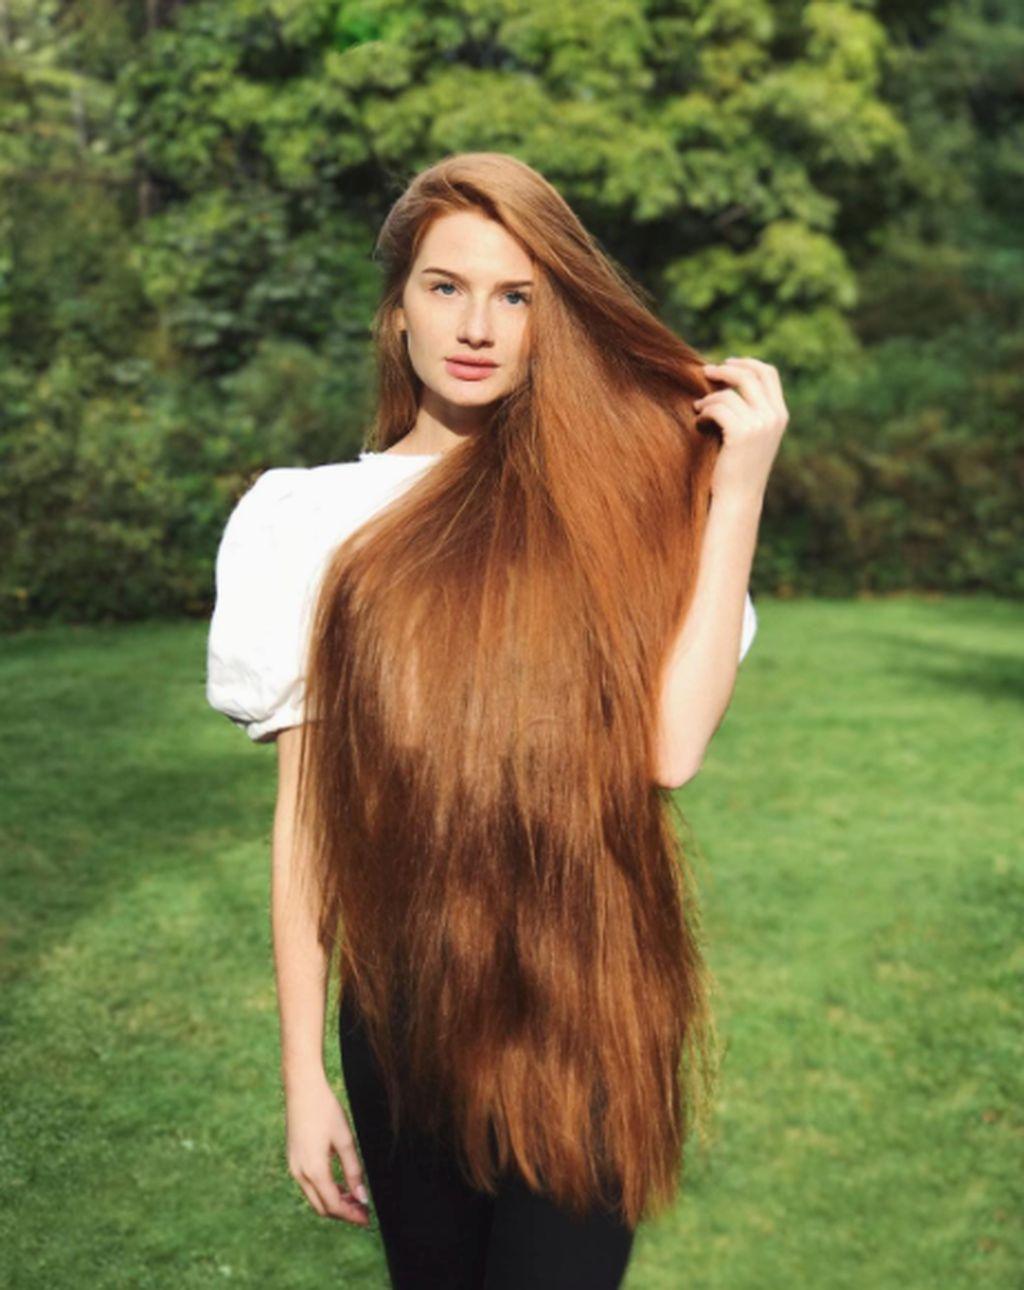 Namanya Anastasia Sidorov, gadis usia 23 tahun asal Rusia. Foto: Instagram